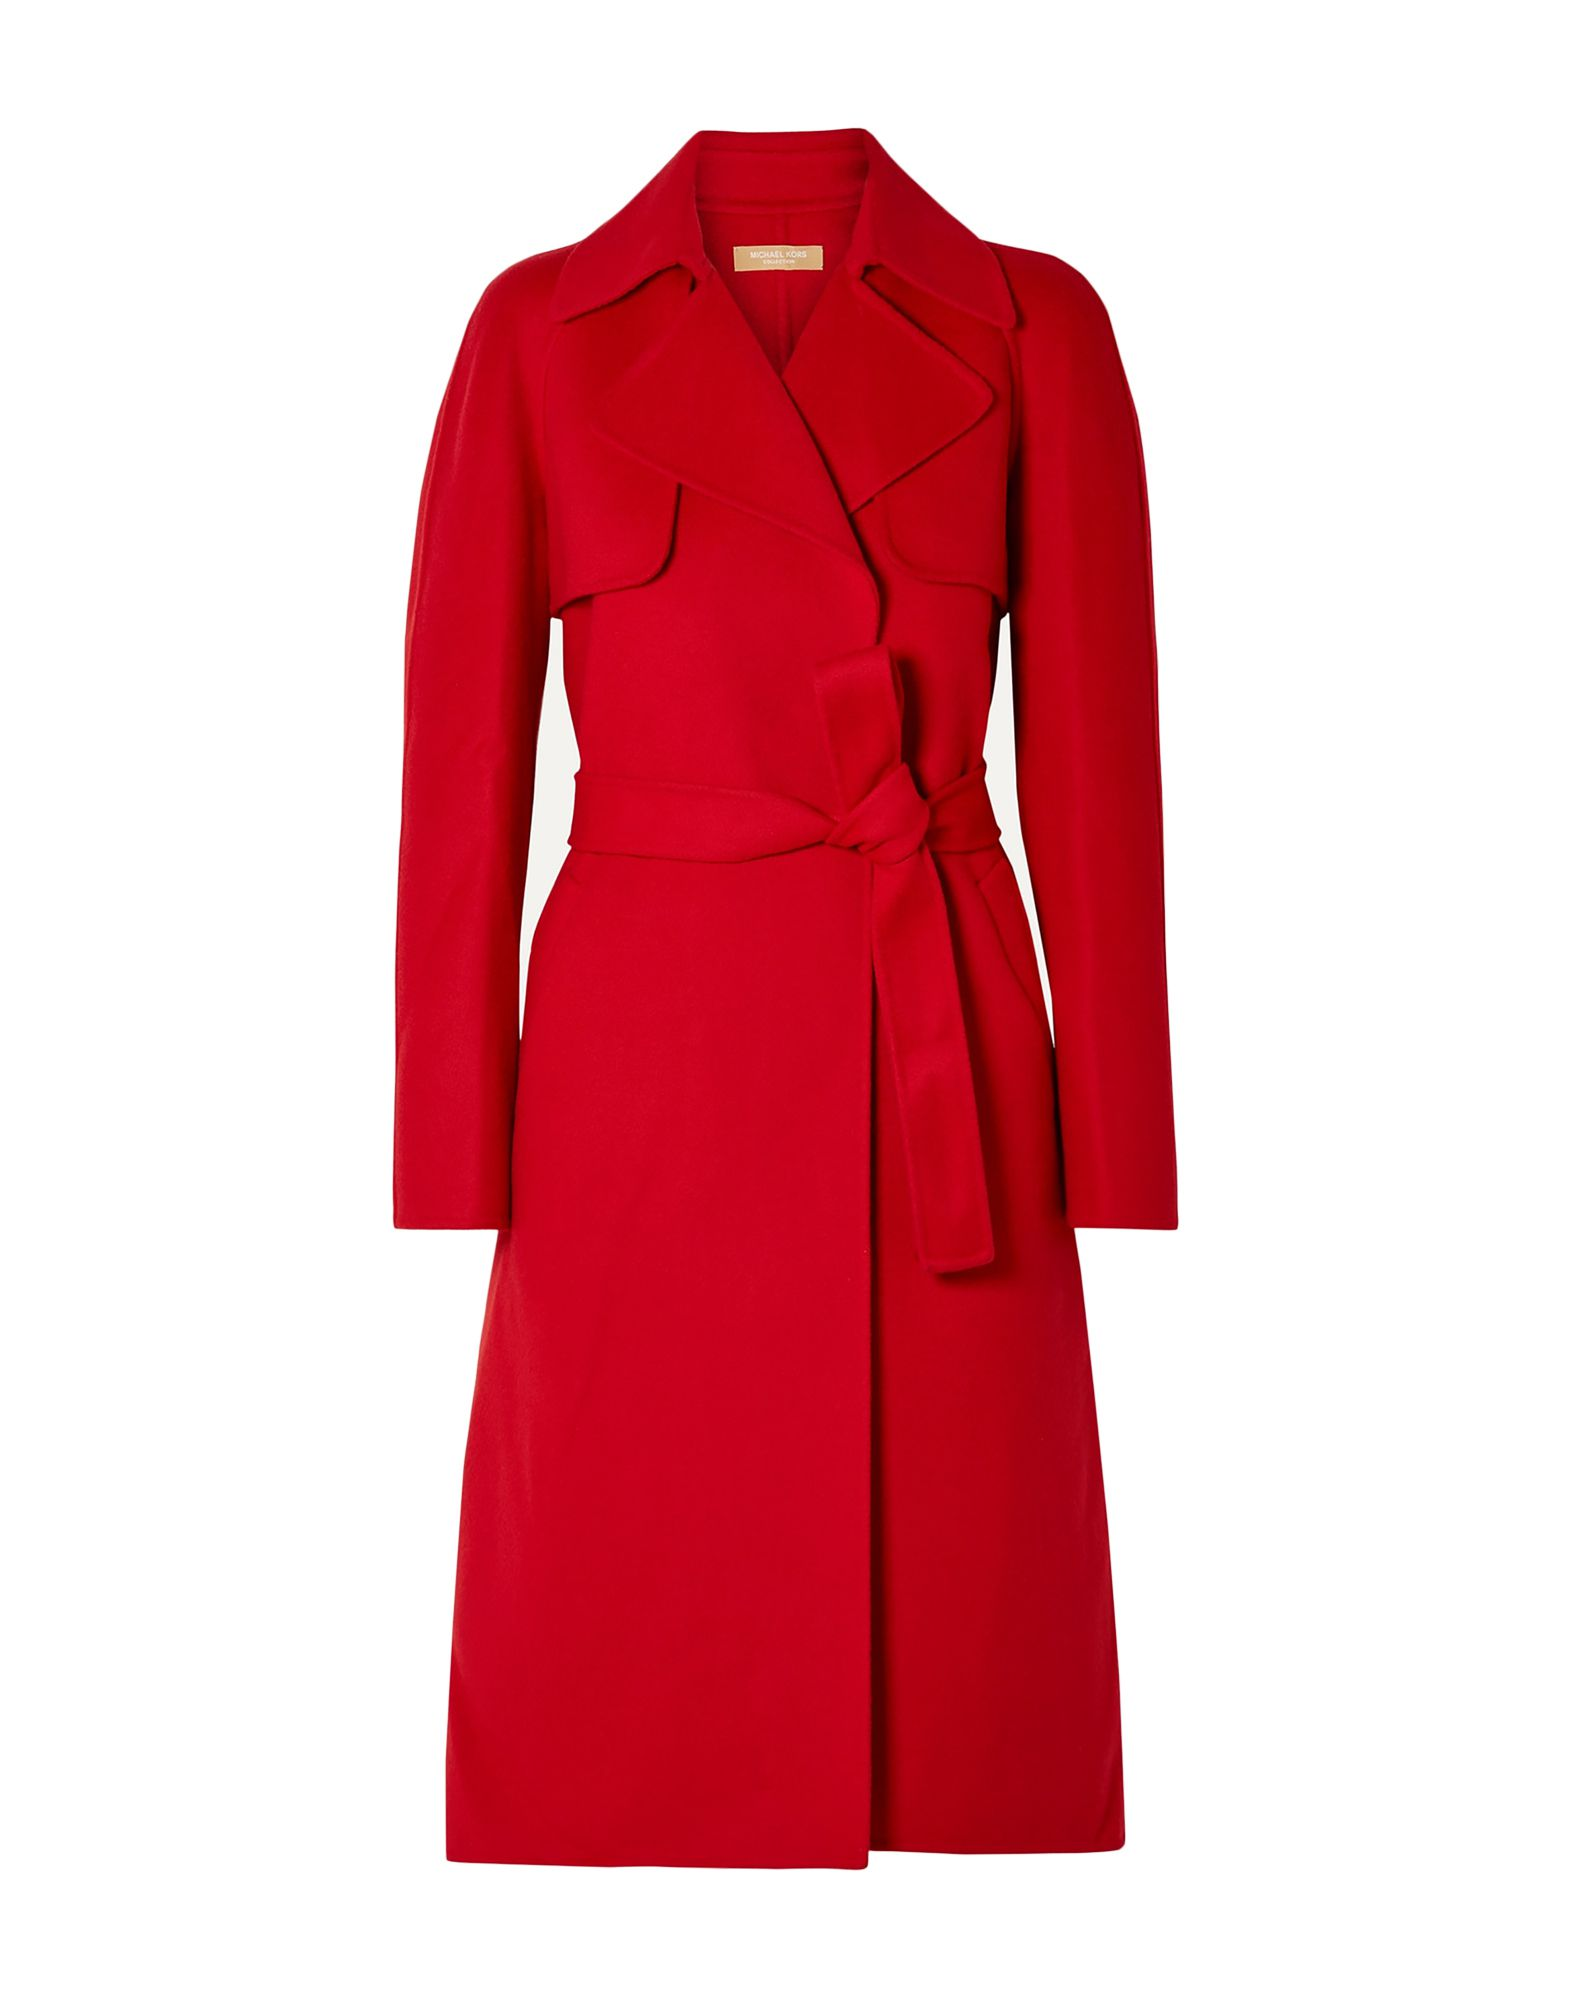 Фото - MICHAEL KORS COLLECTION Пальто michael kors collection юбка длиной 3 4